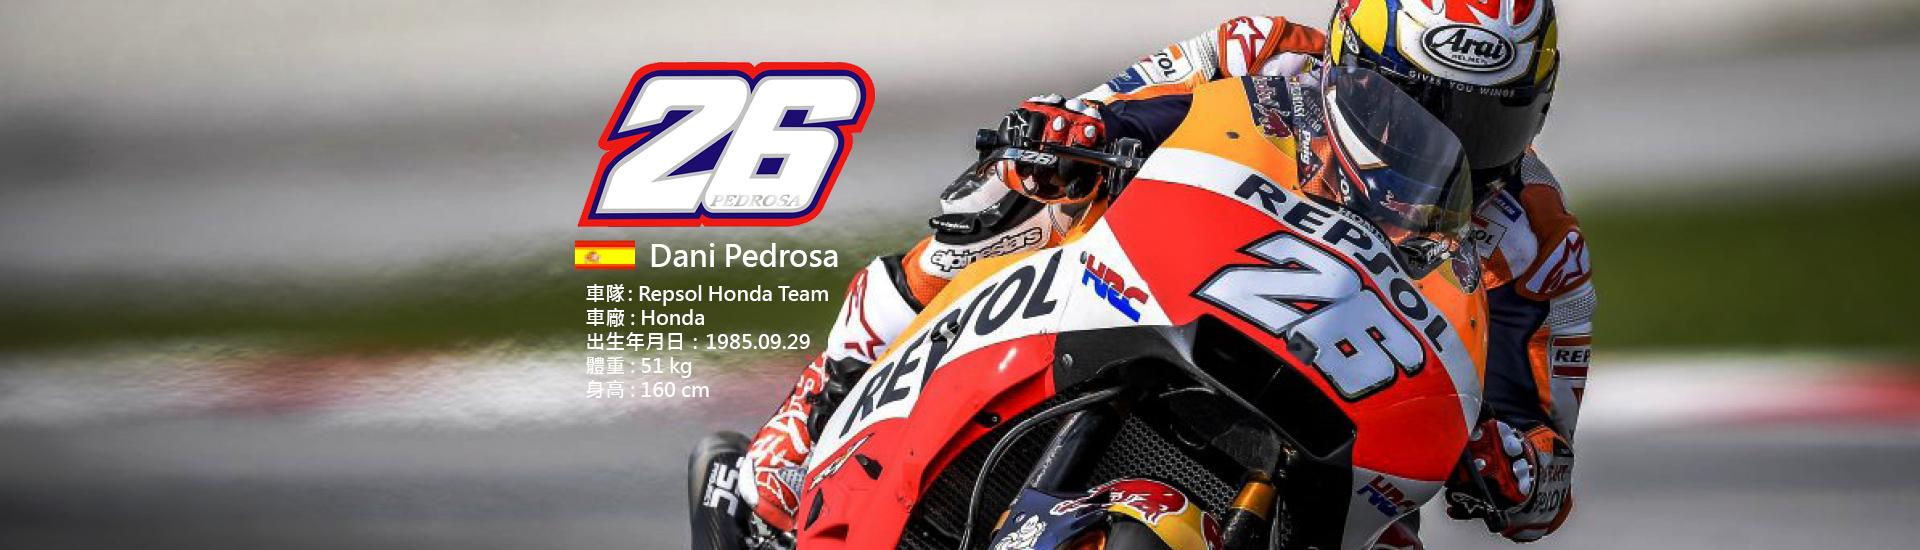 2018 MotoGP 【26】Dani Pedrosa